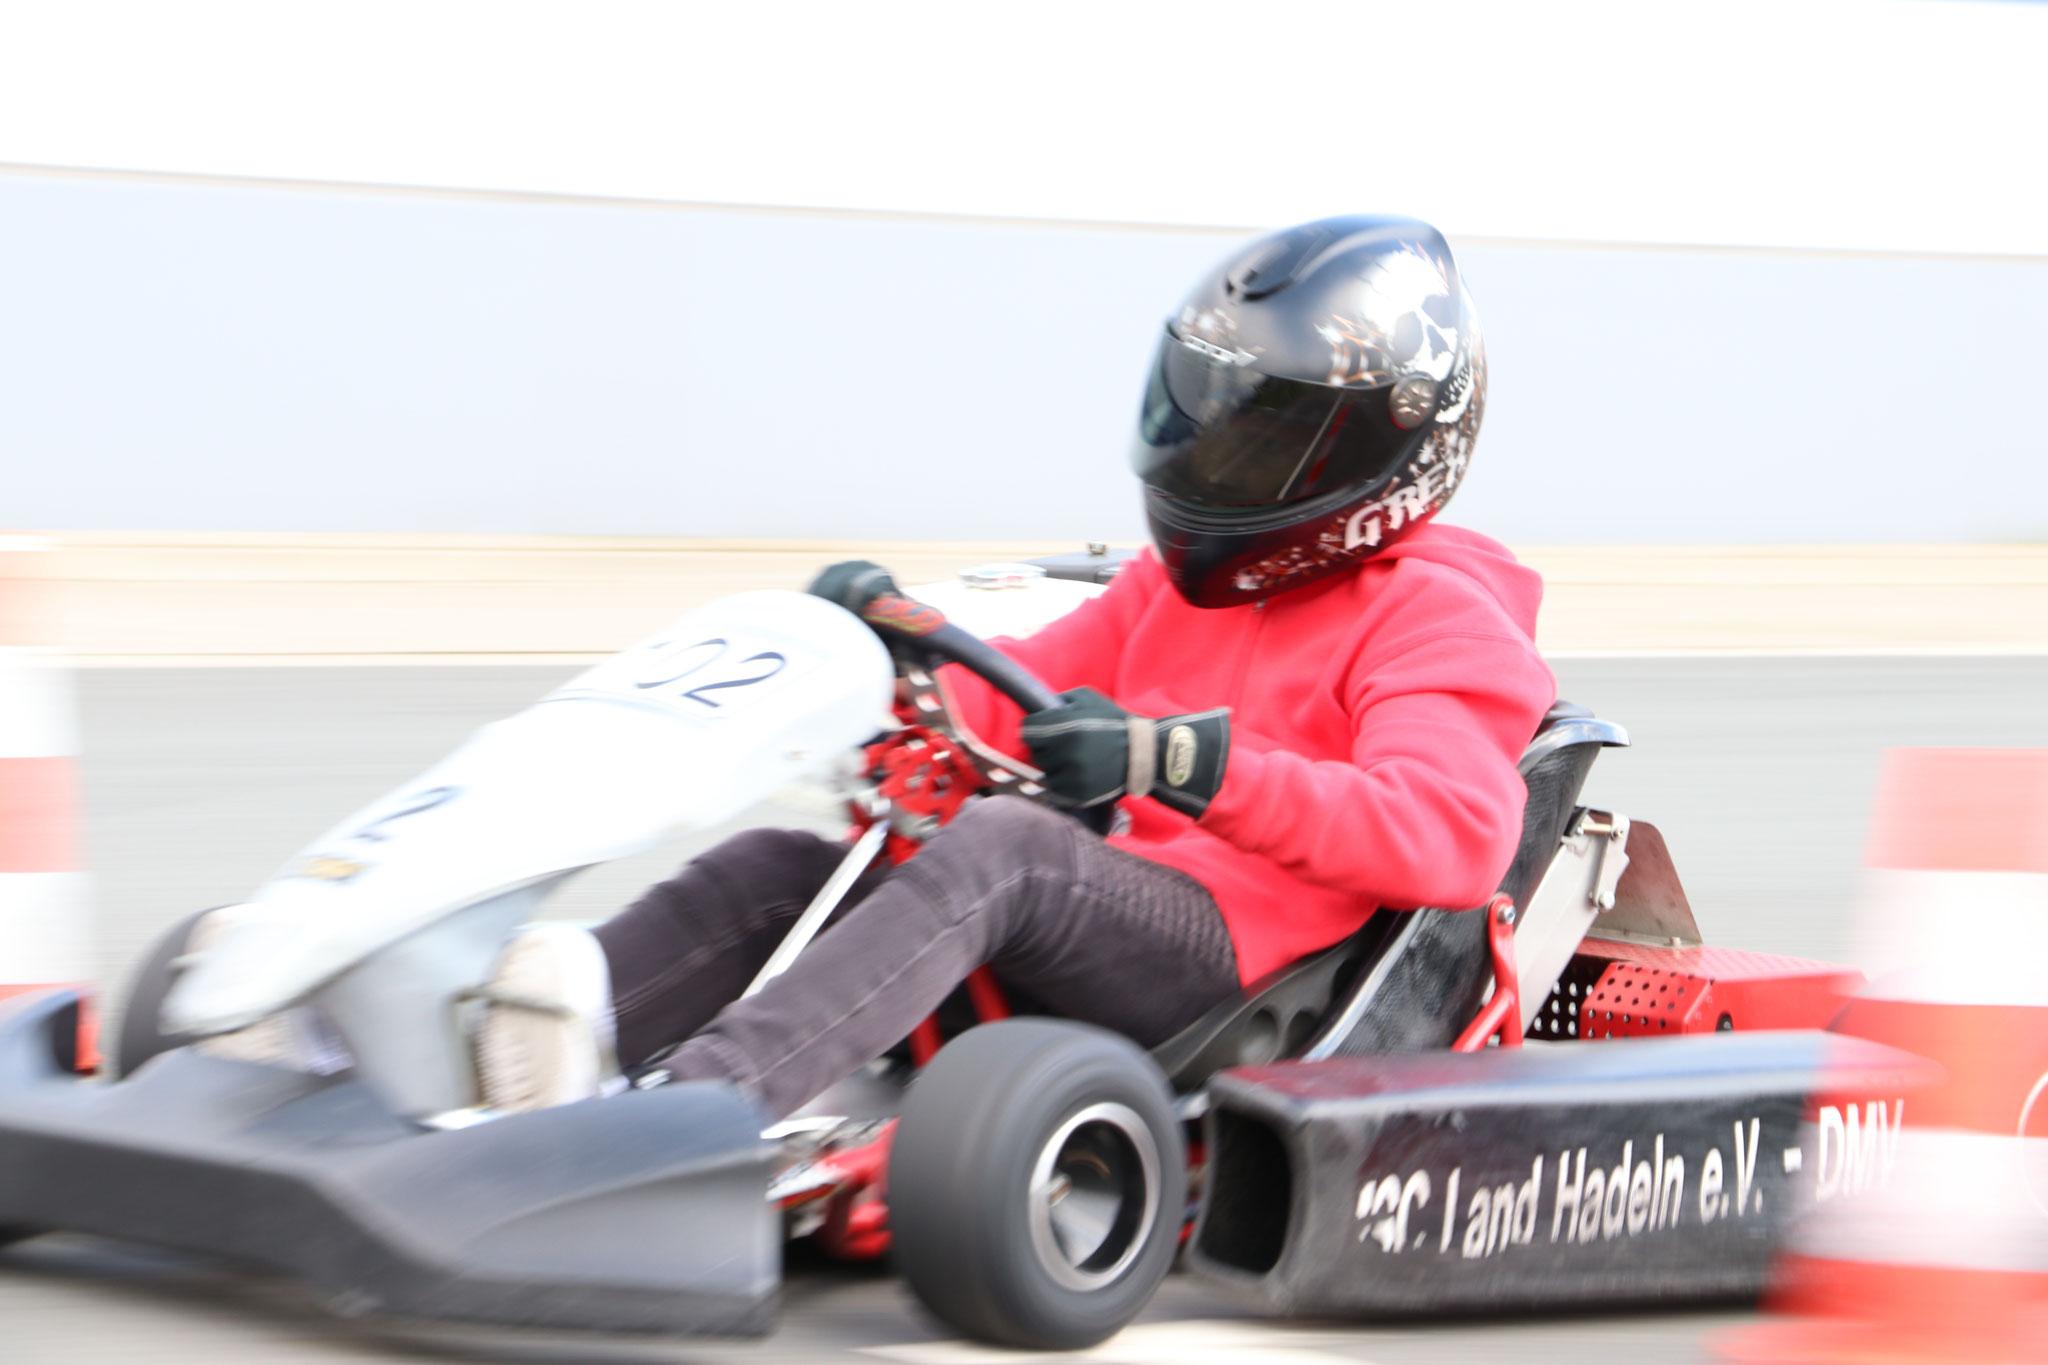 Warmfahrer Kim-Lukas Rohde-Draeseke